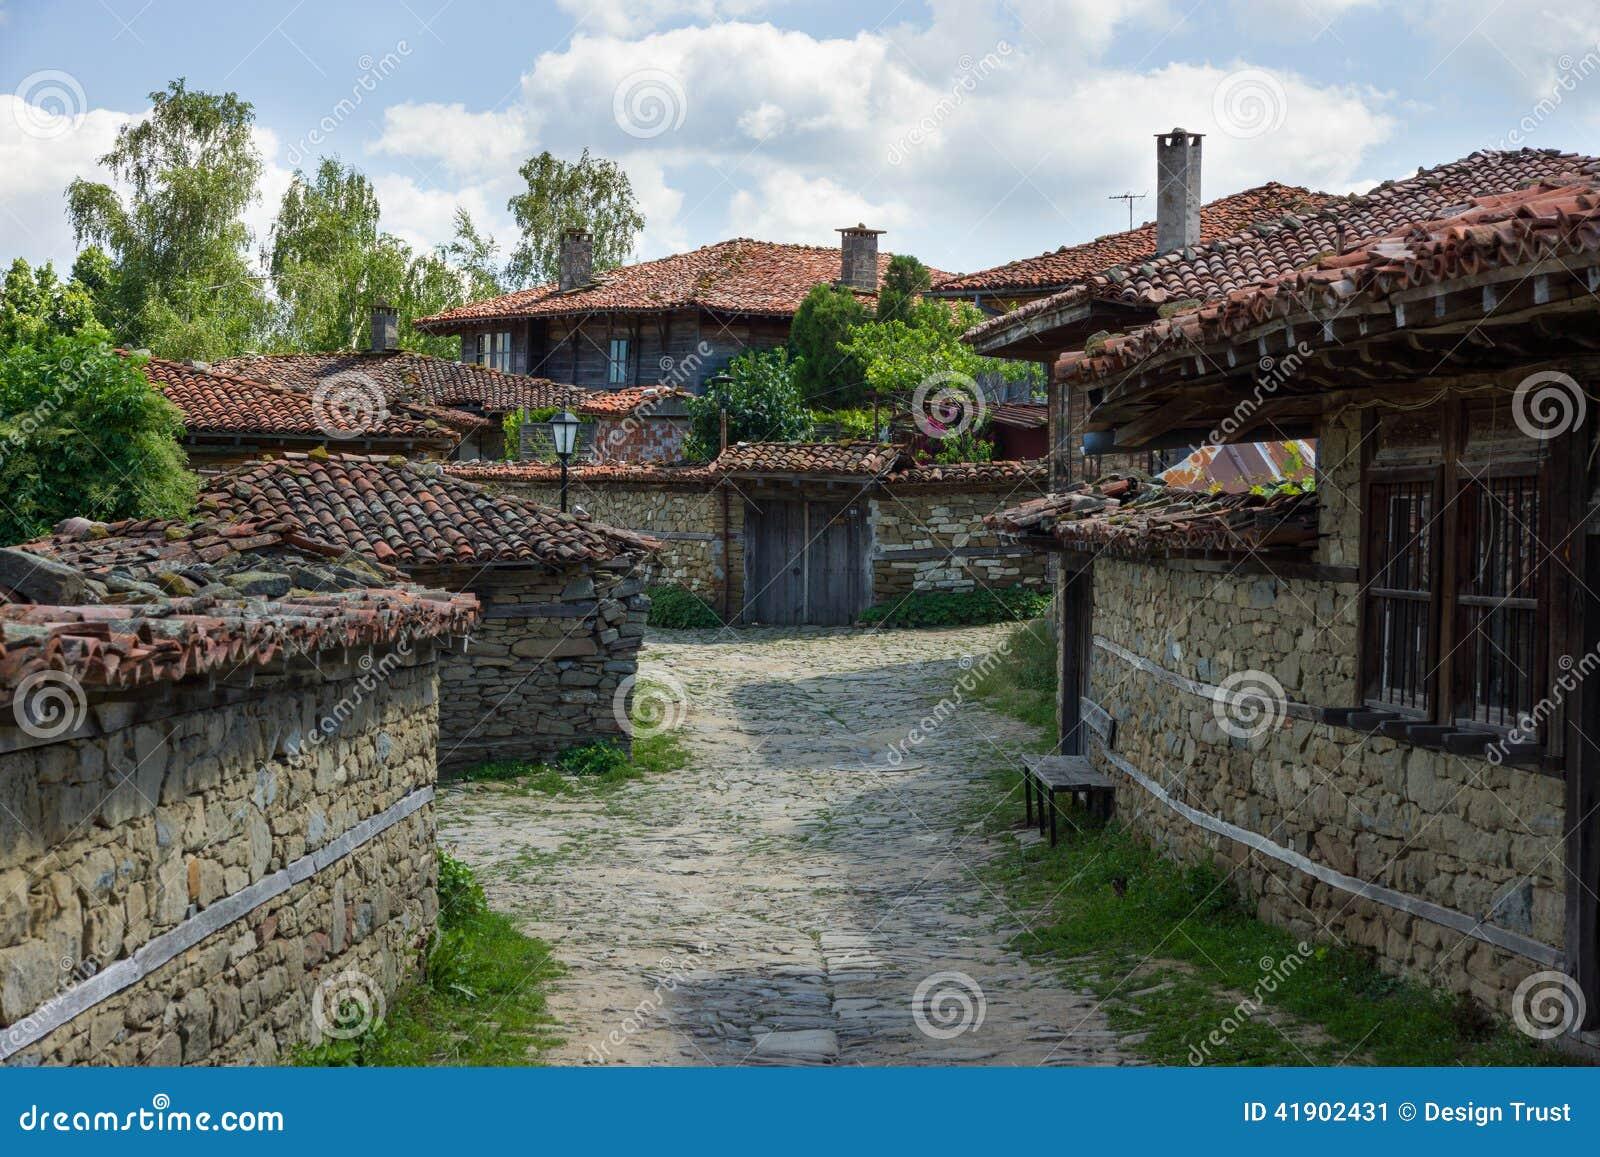 Rural winding street in the Balkans